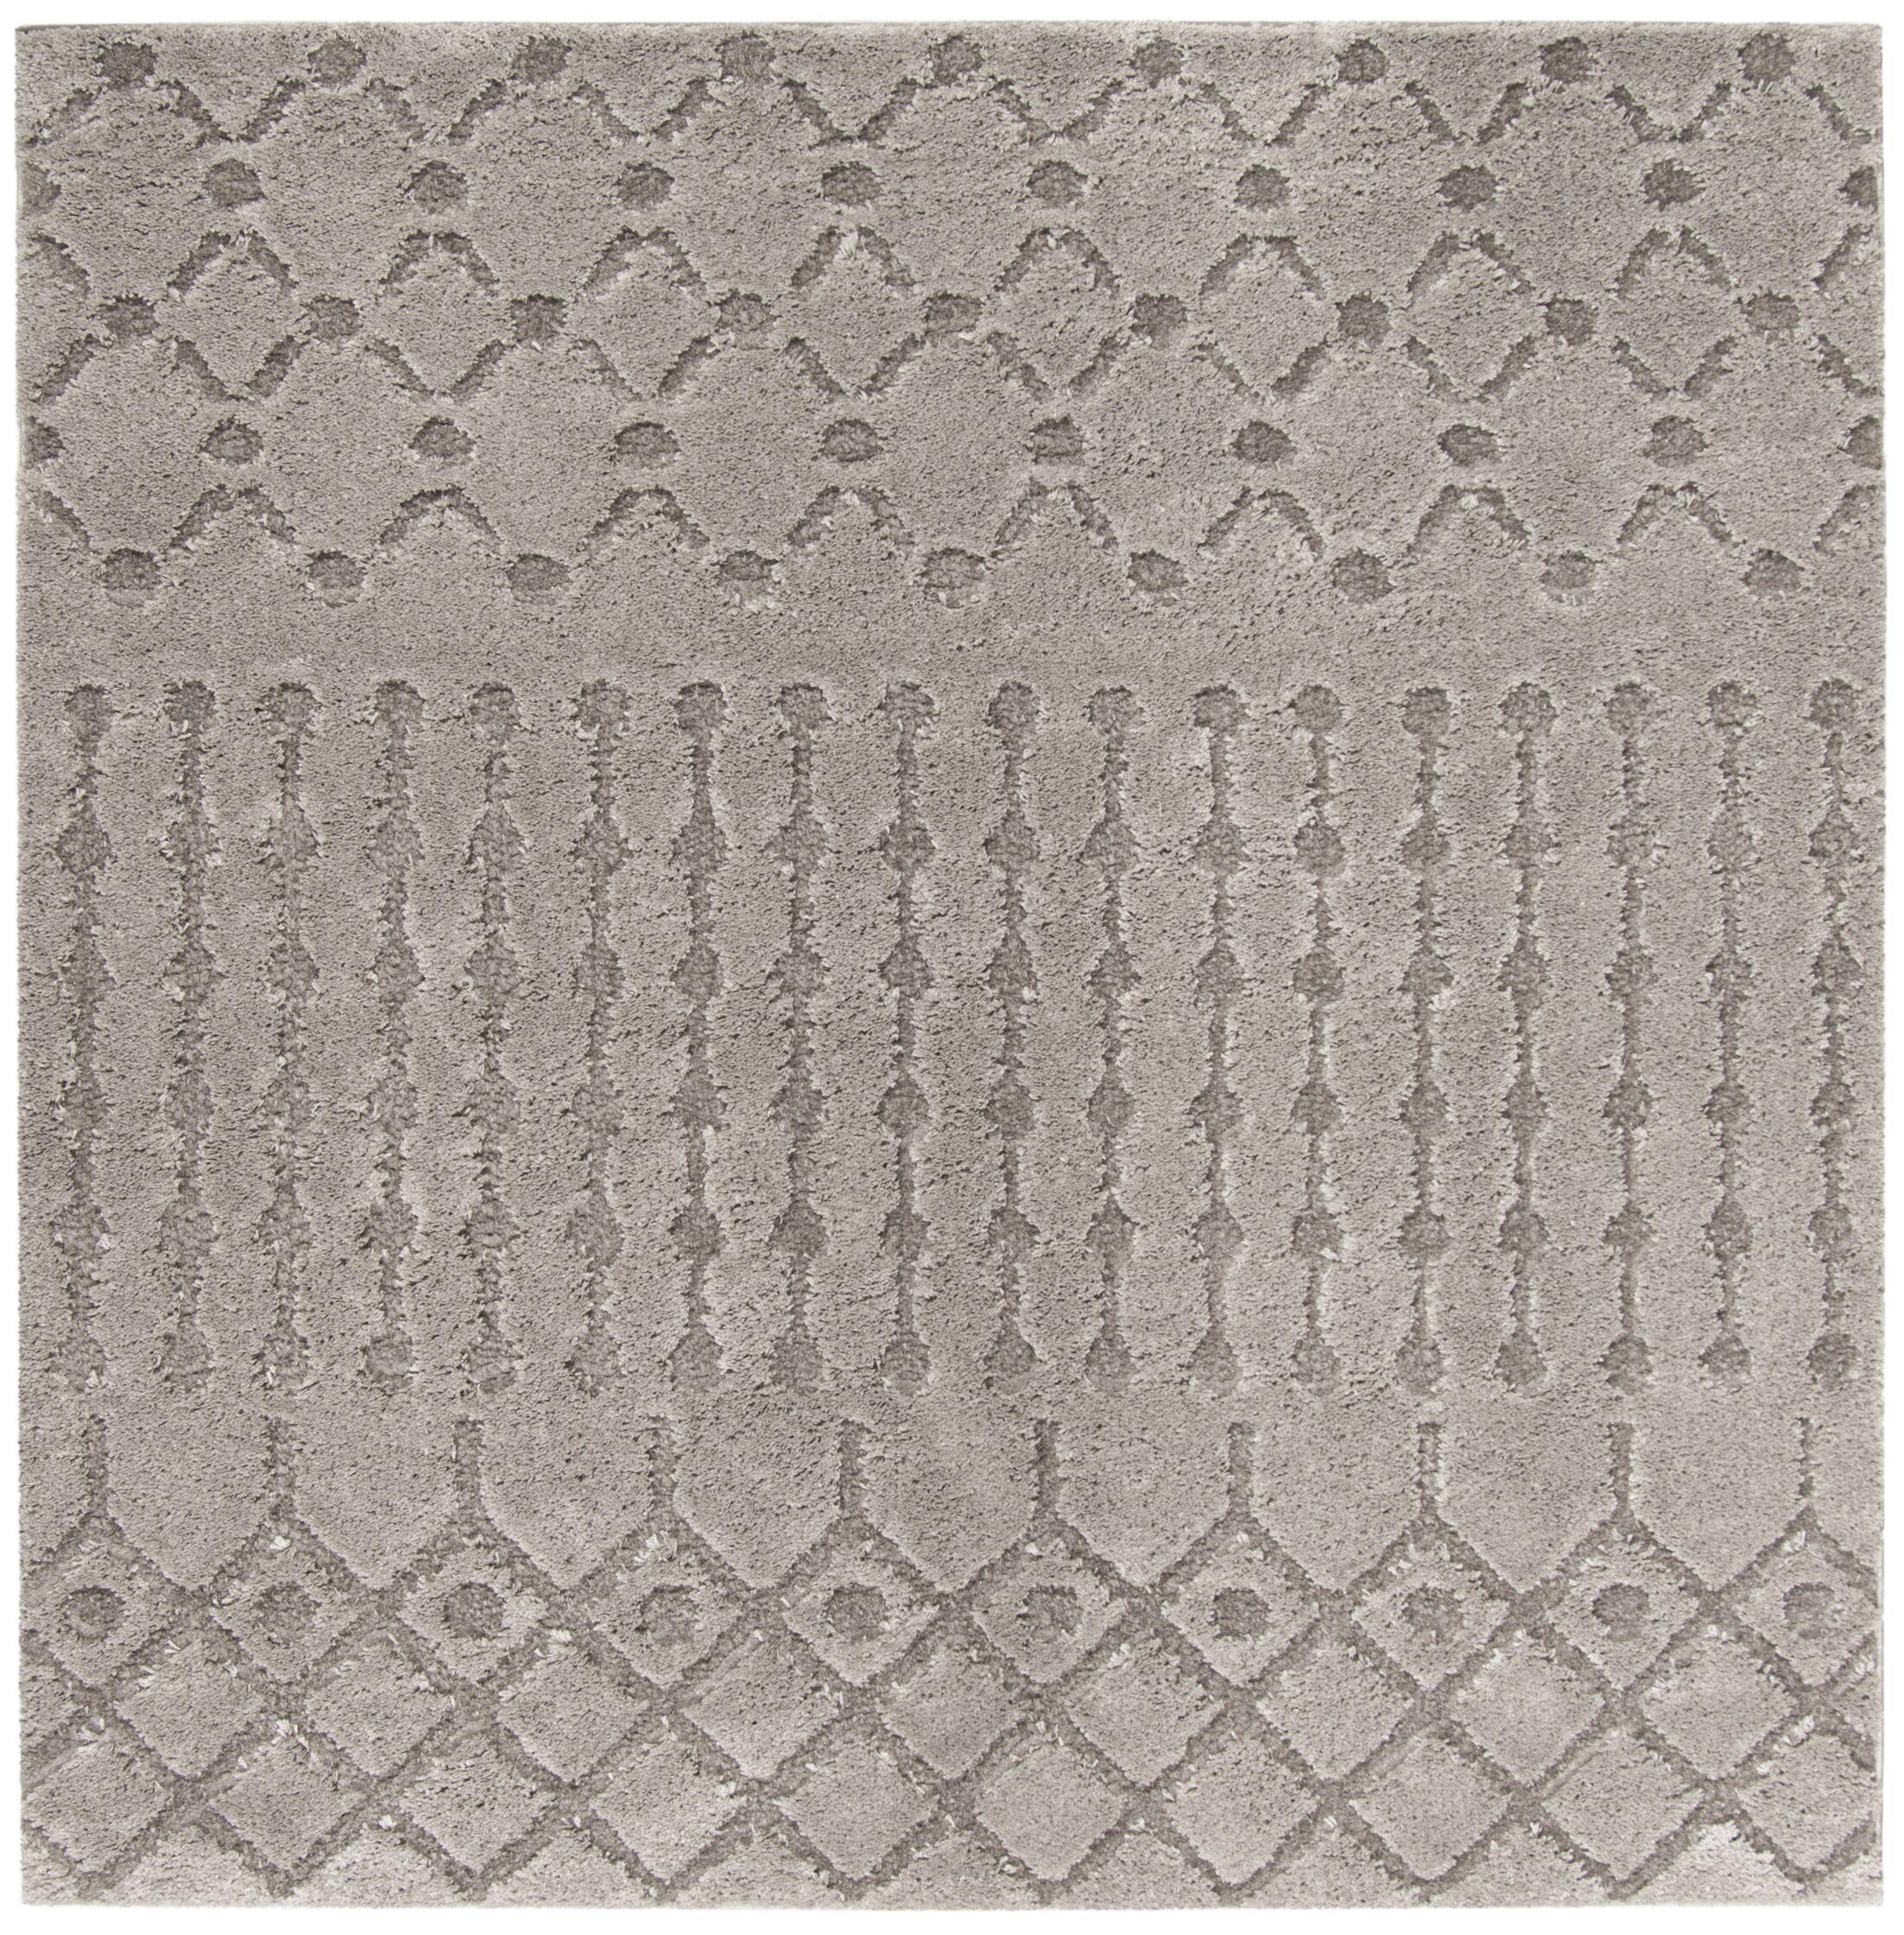 Champlain Gray Area Rug Rug Size: Rectangle 8' x 10'